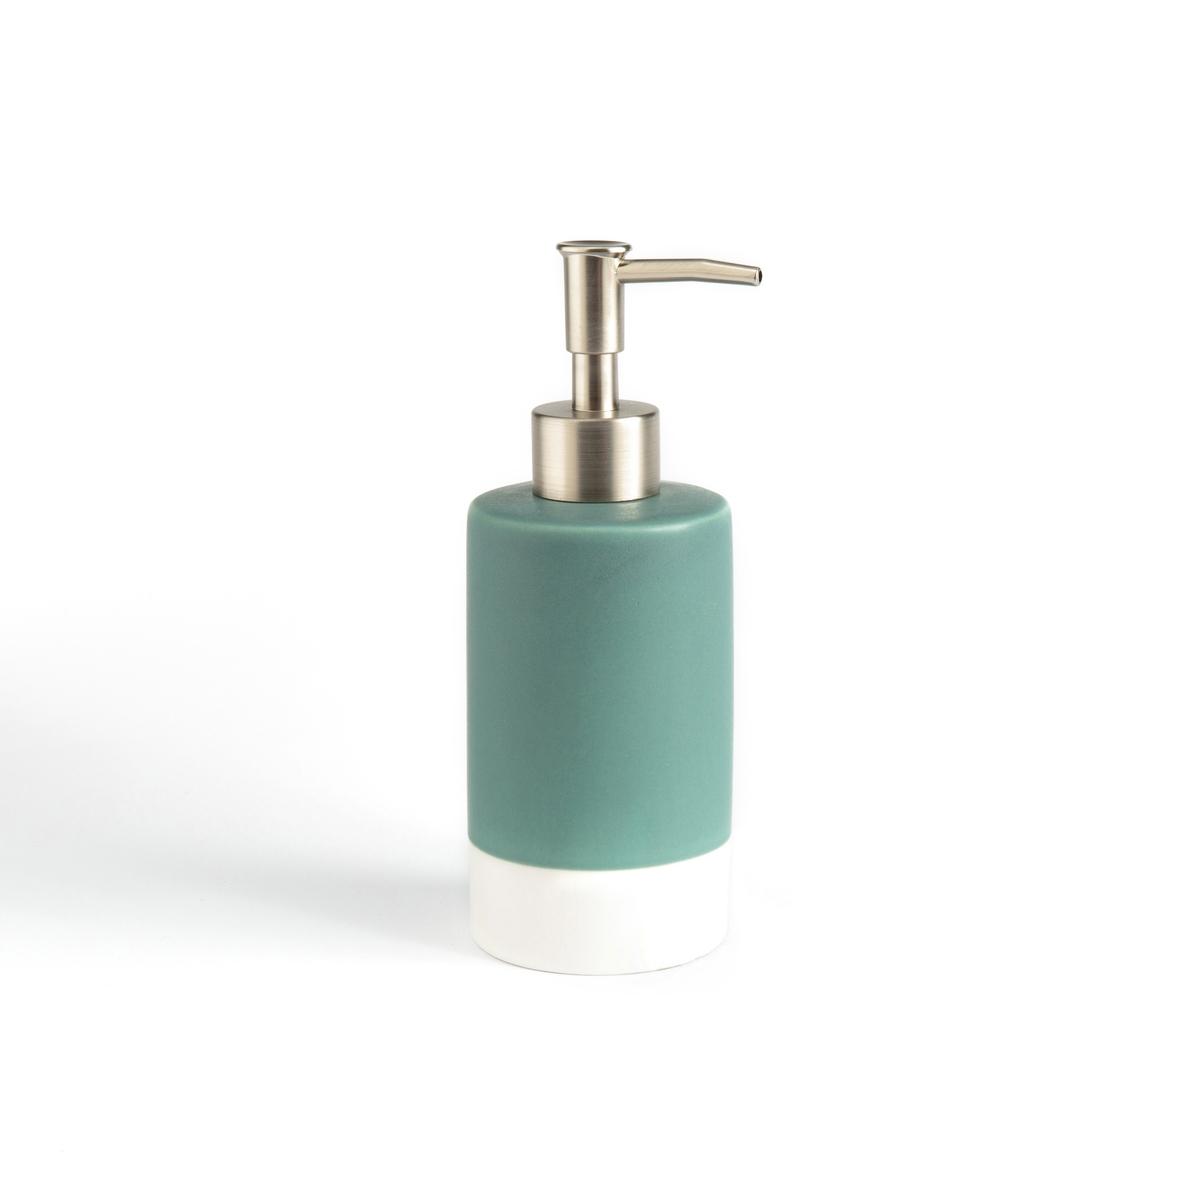 Seifenspender CALIADE | Bad > Bad-Accessoires > Seifenspender | Grün | Keramik | La Redoute Interieurs